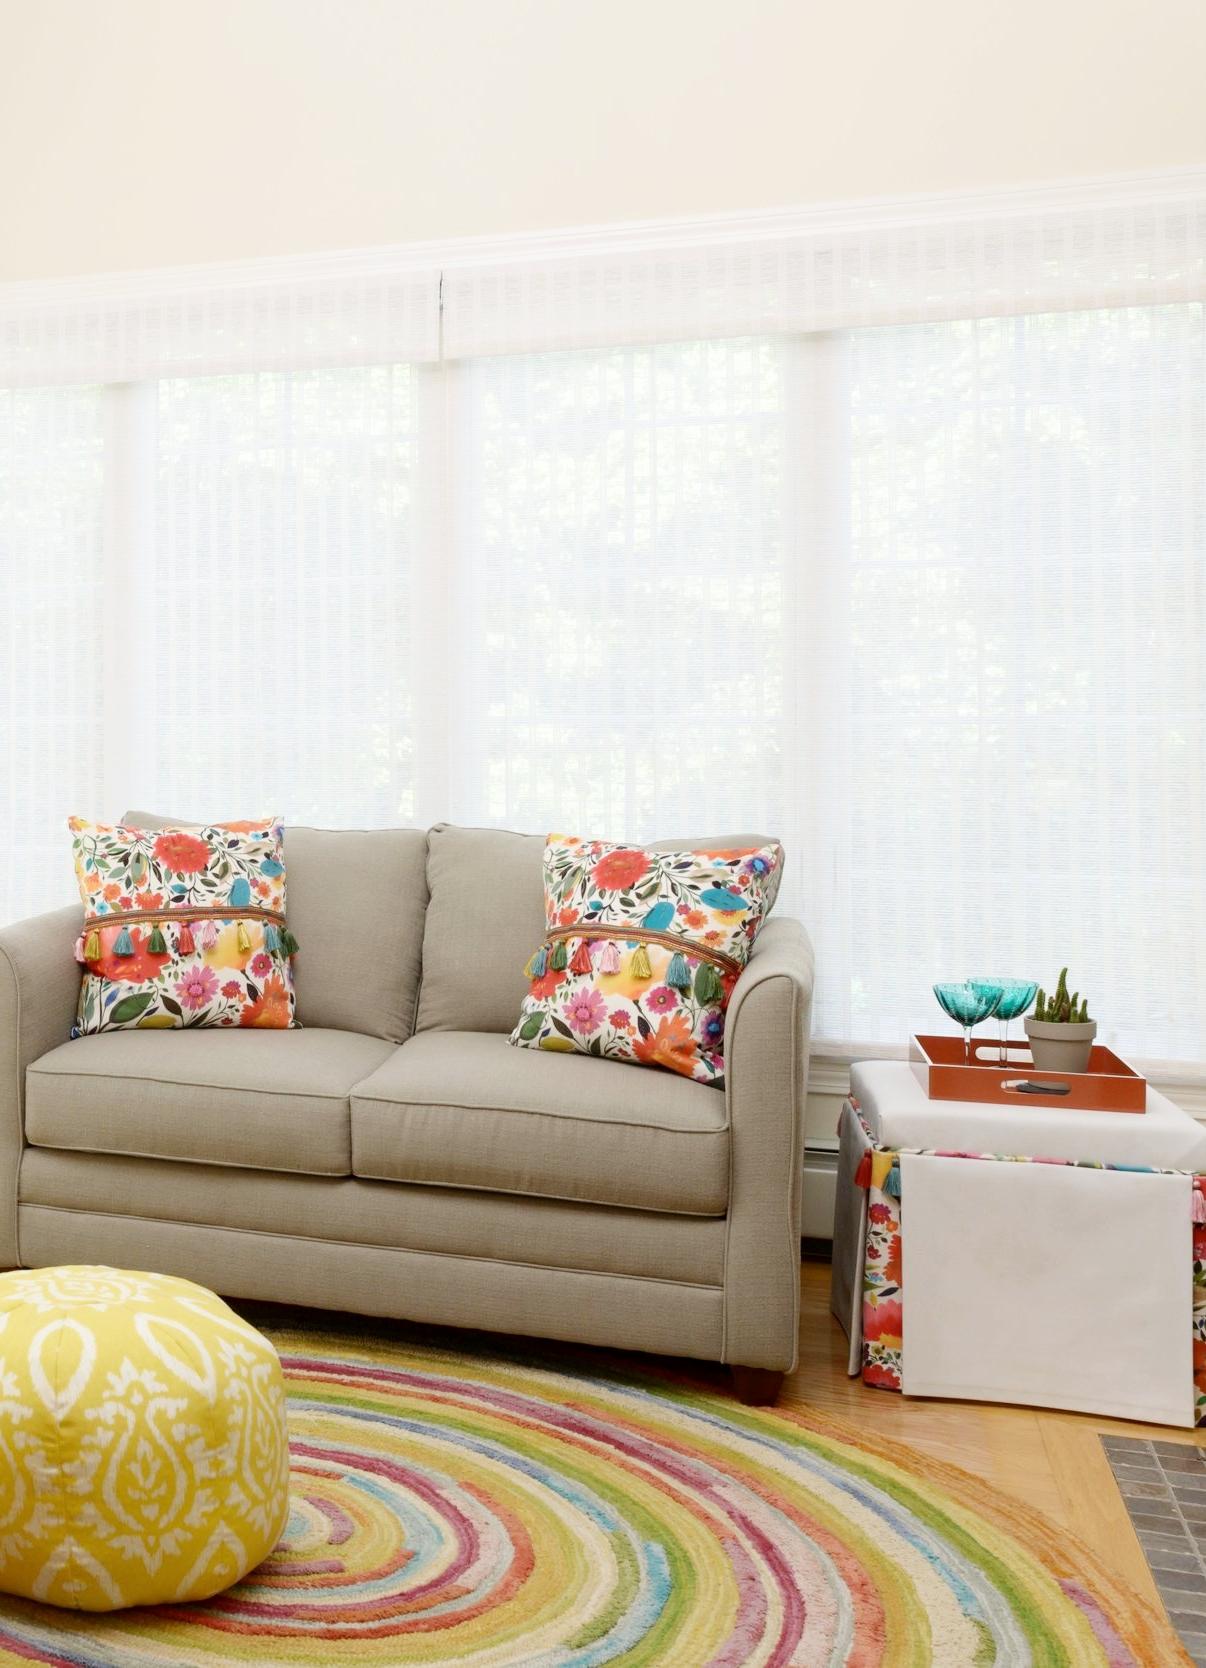 interior-design-window-treatments-upholstery-pillows-derry-manchester-3.jpg